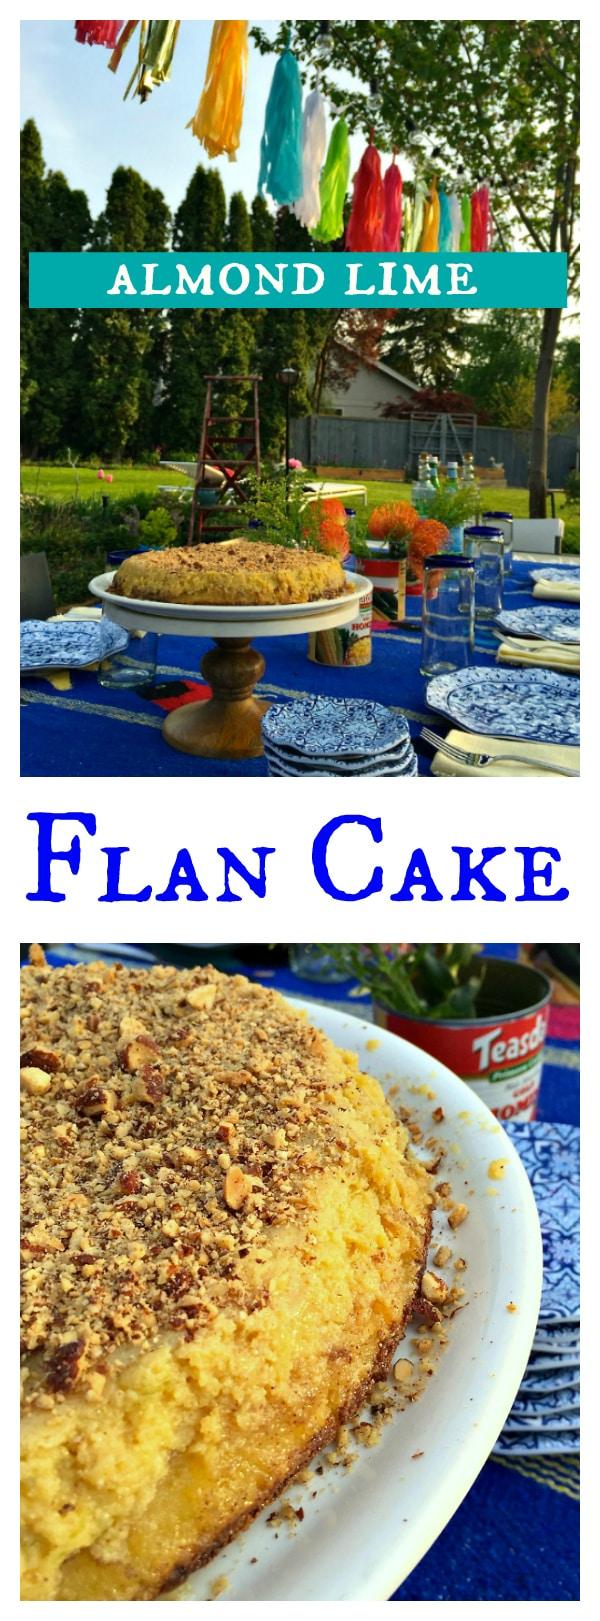 Almond Lime Flan Cake